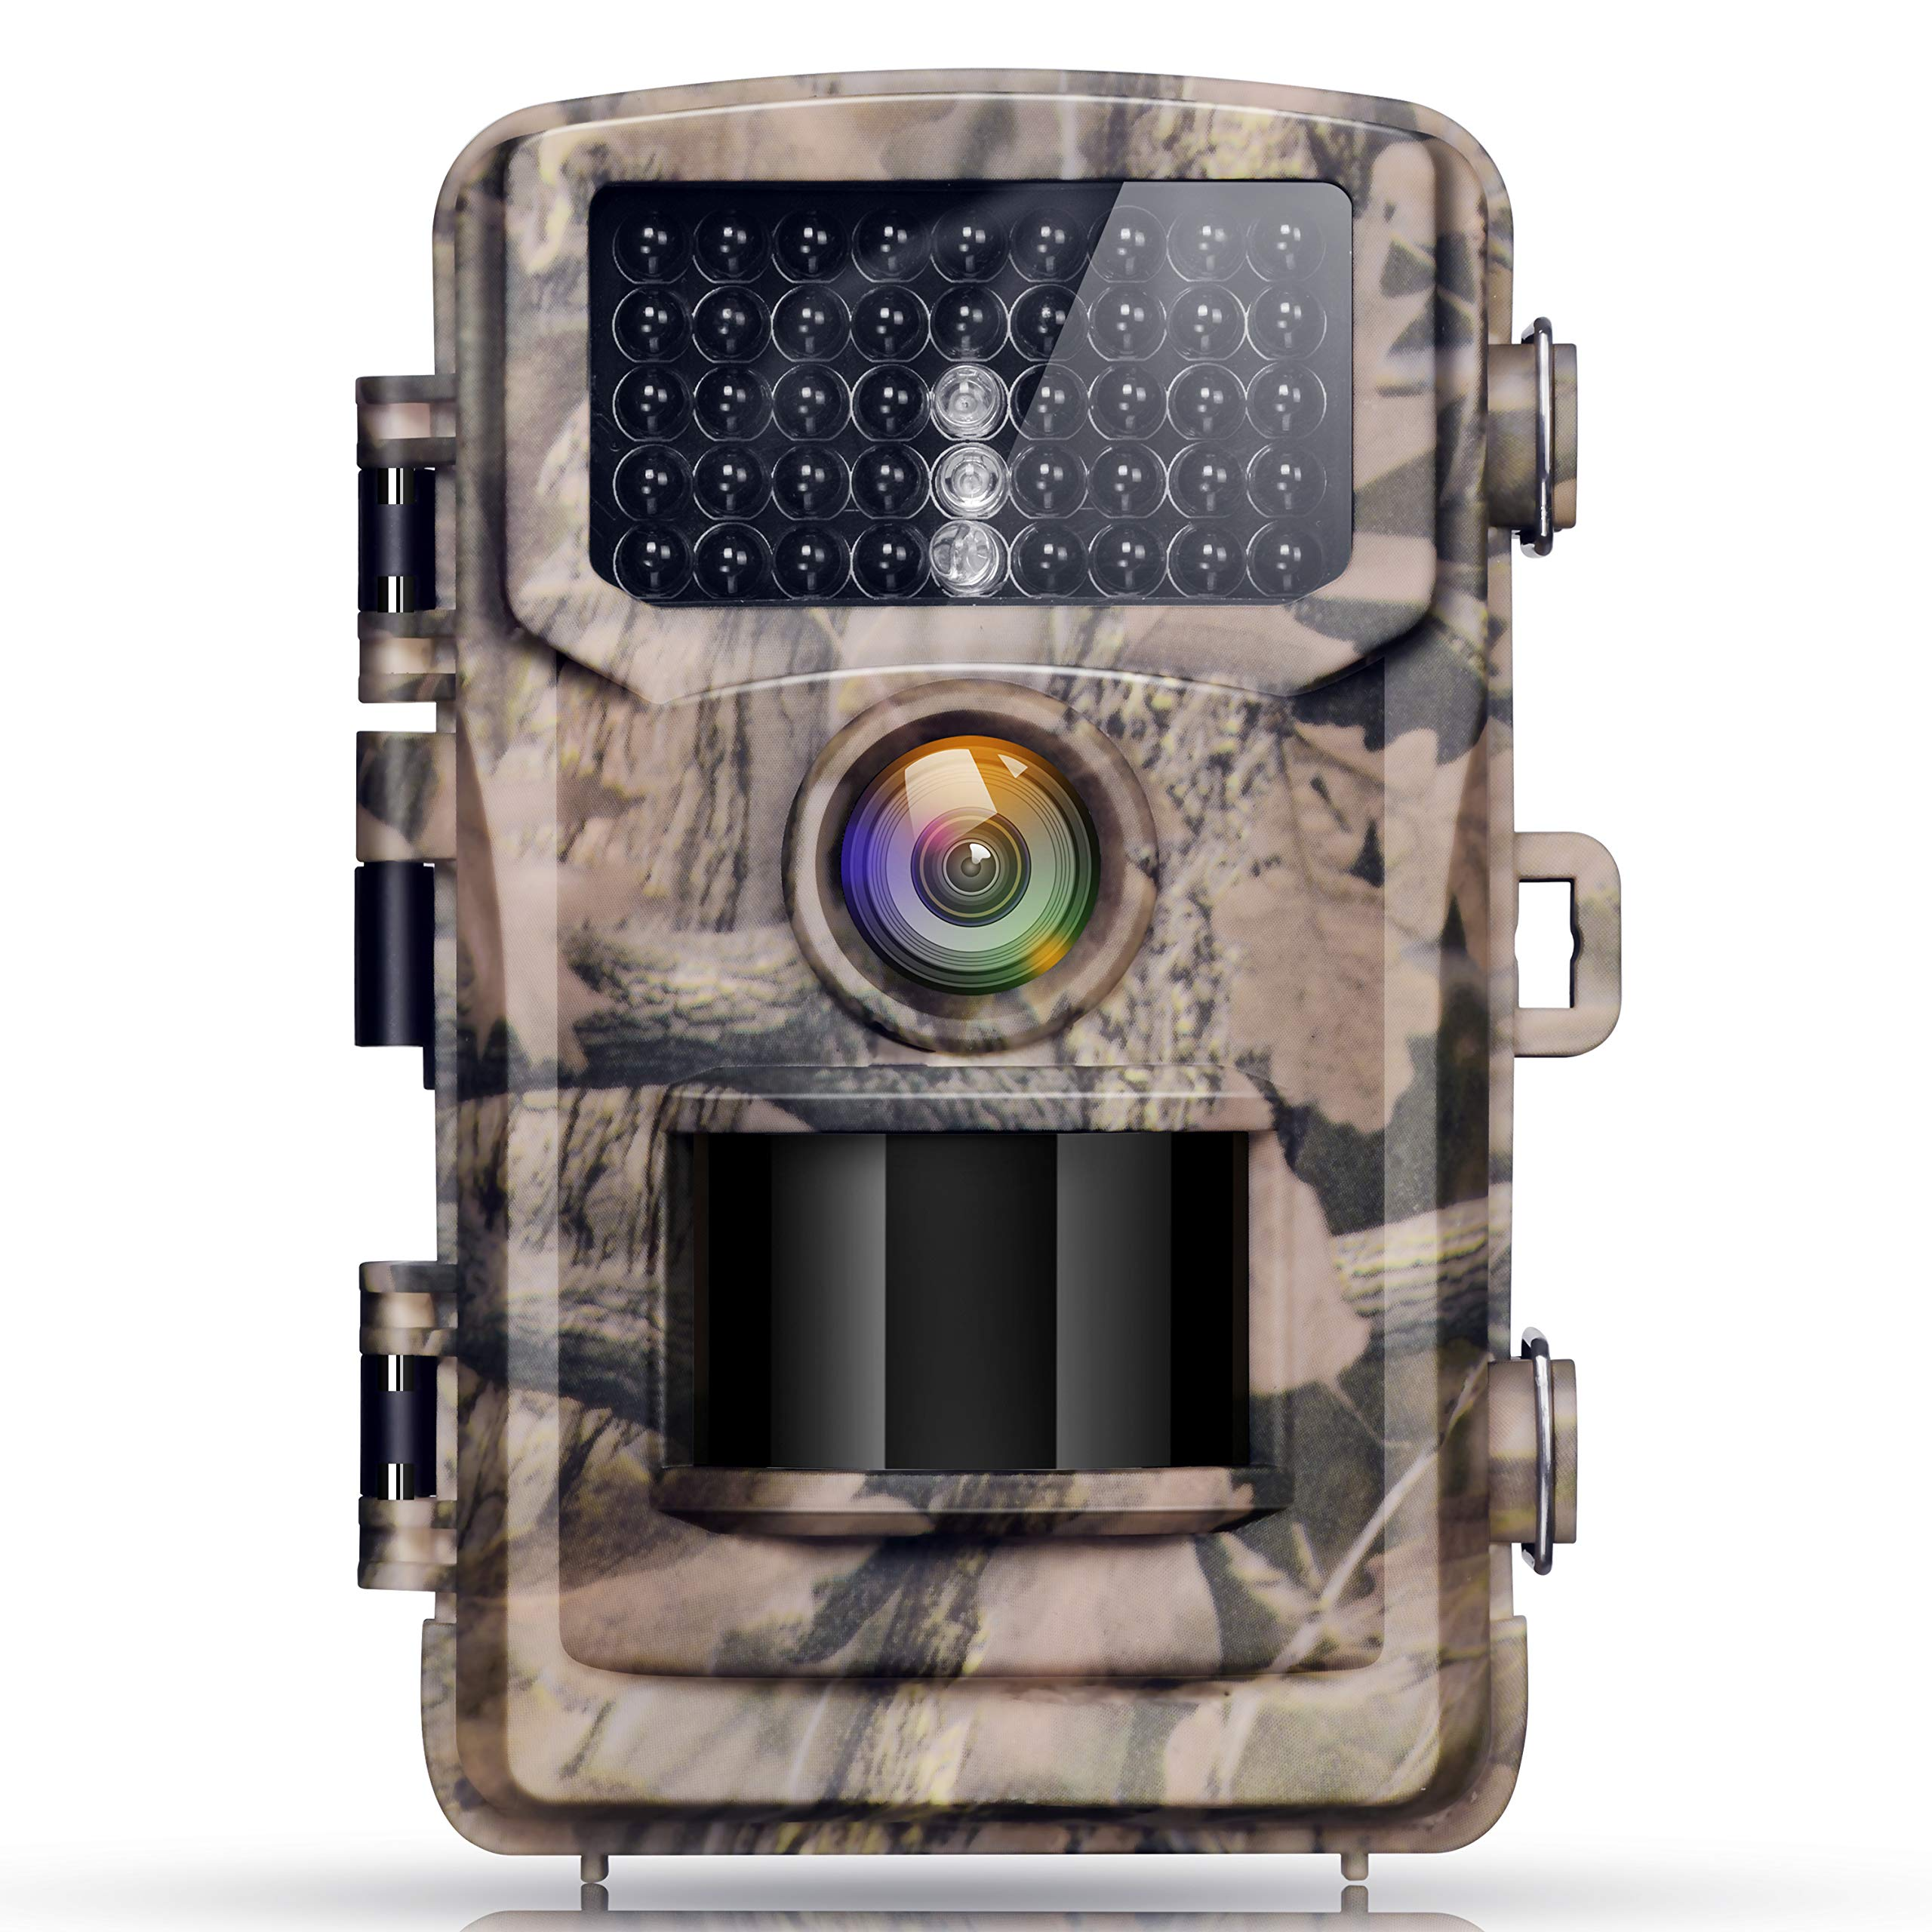 Campark Game Waterproof Trail Camera